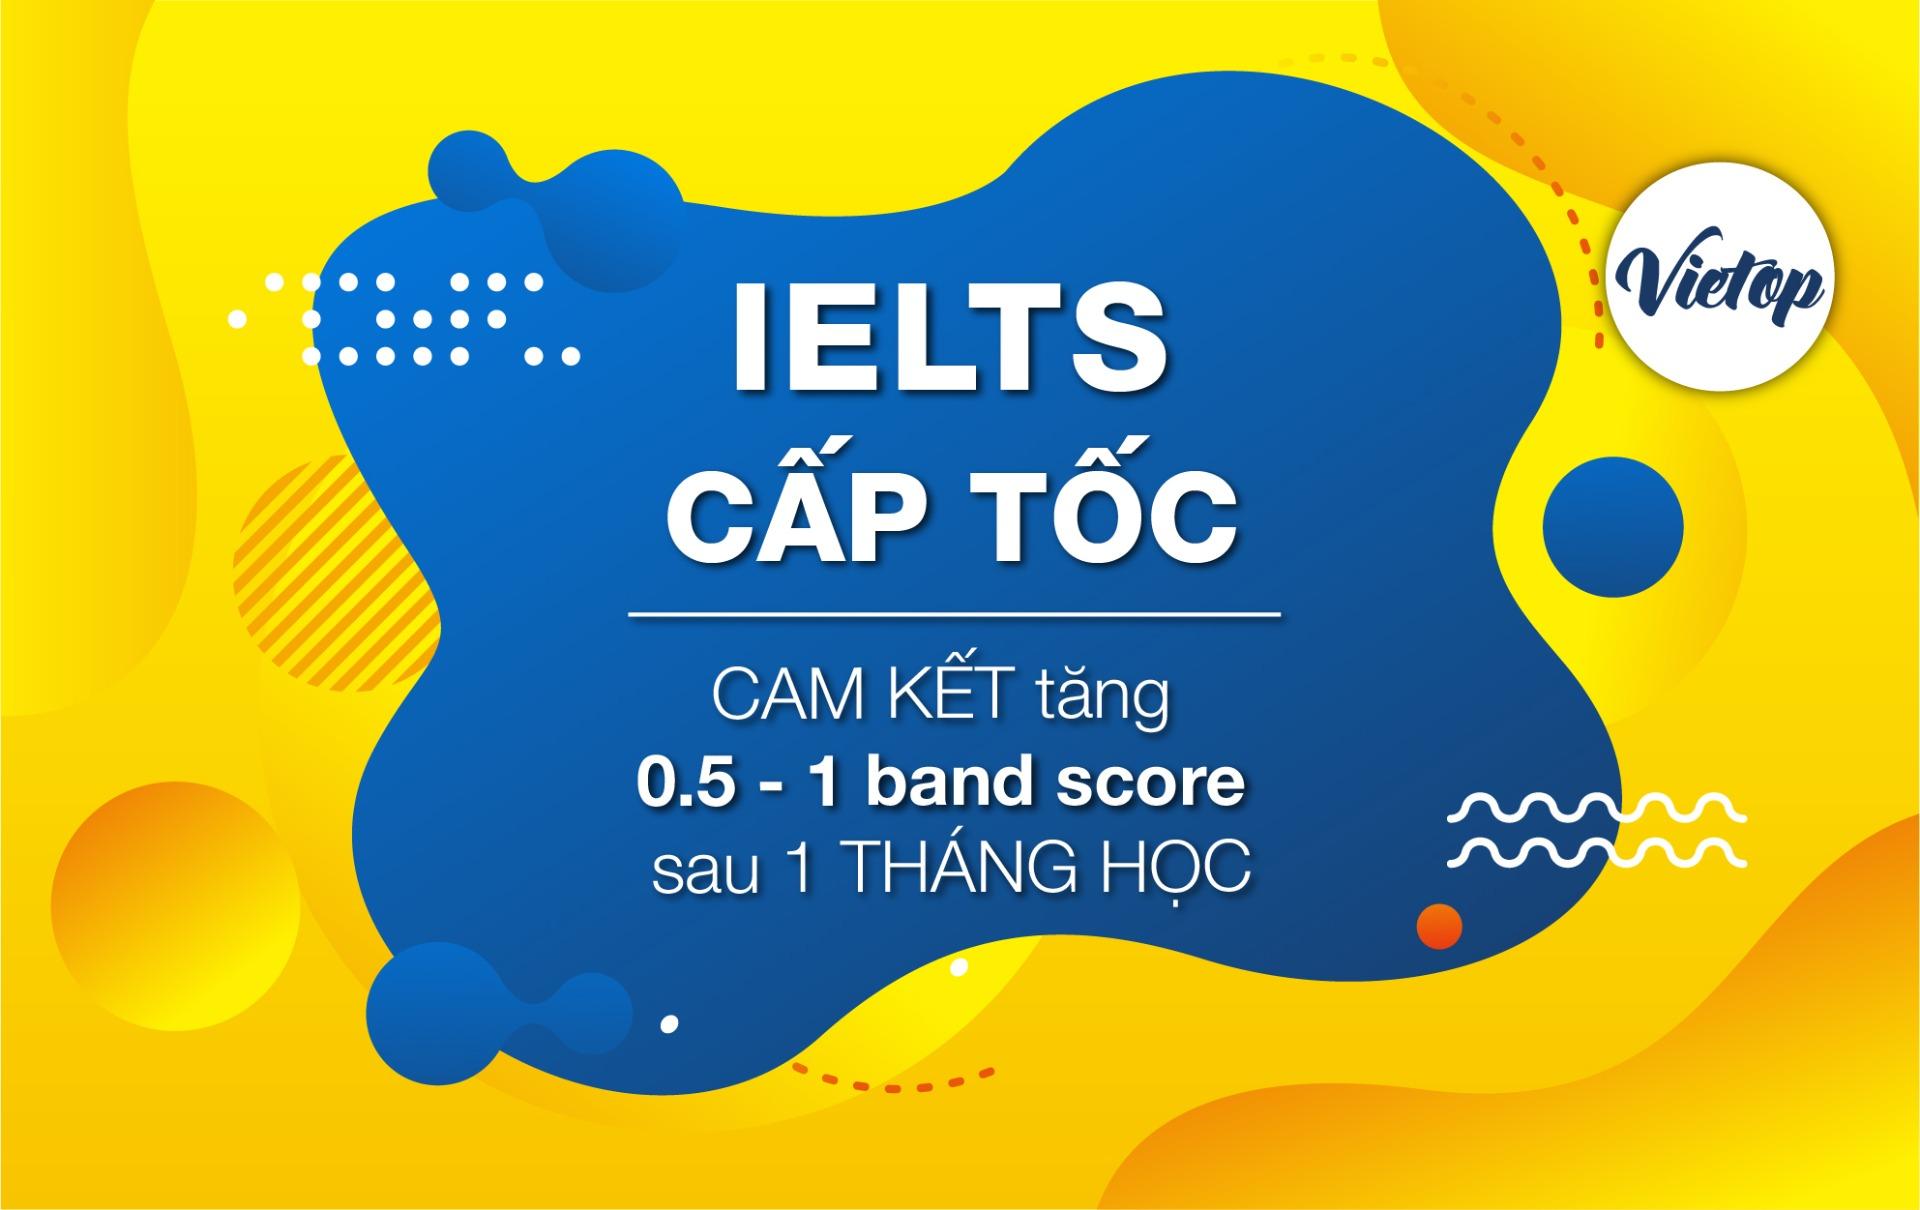 Học IELTS Cấp tốc TPHCM